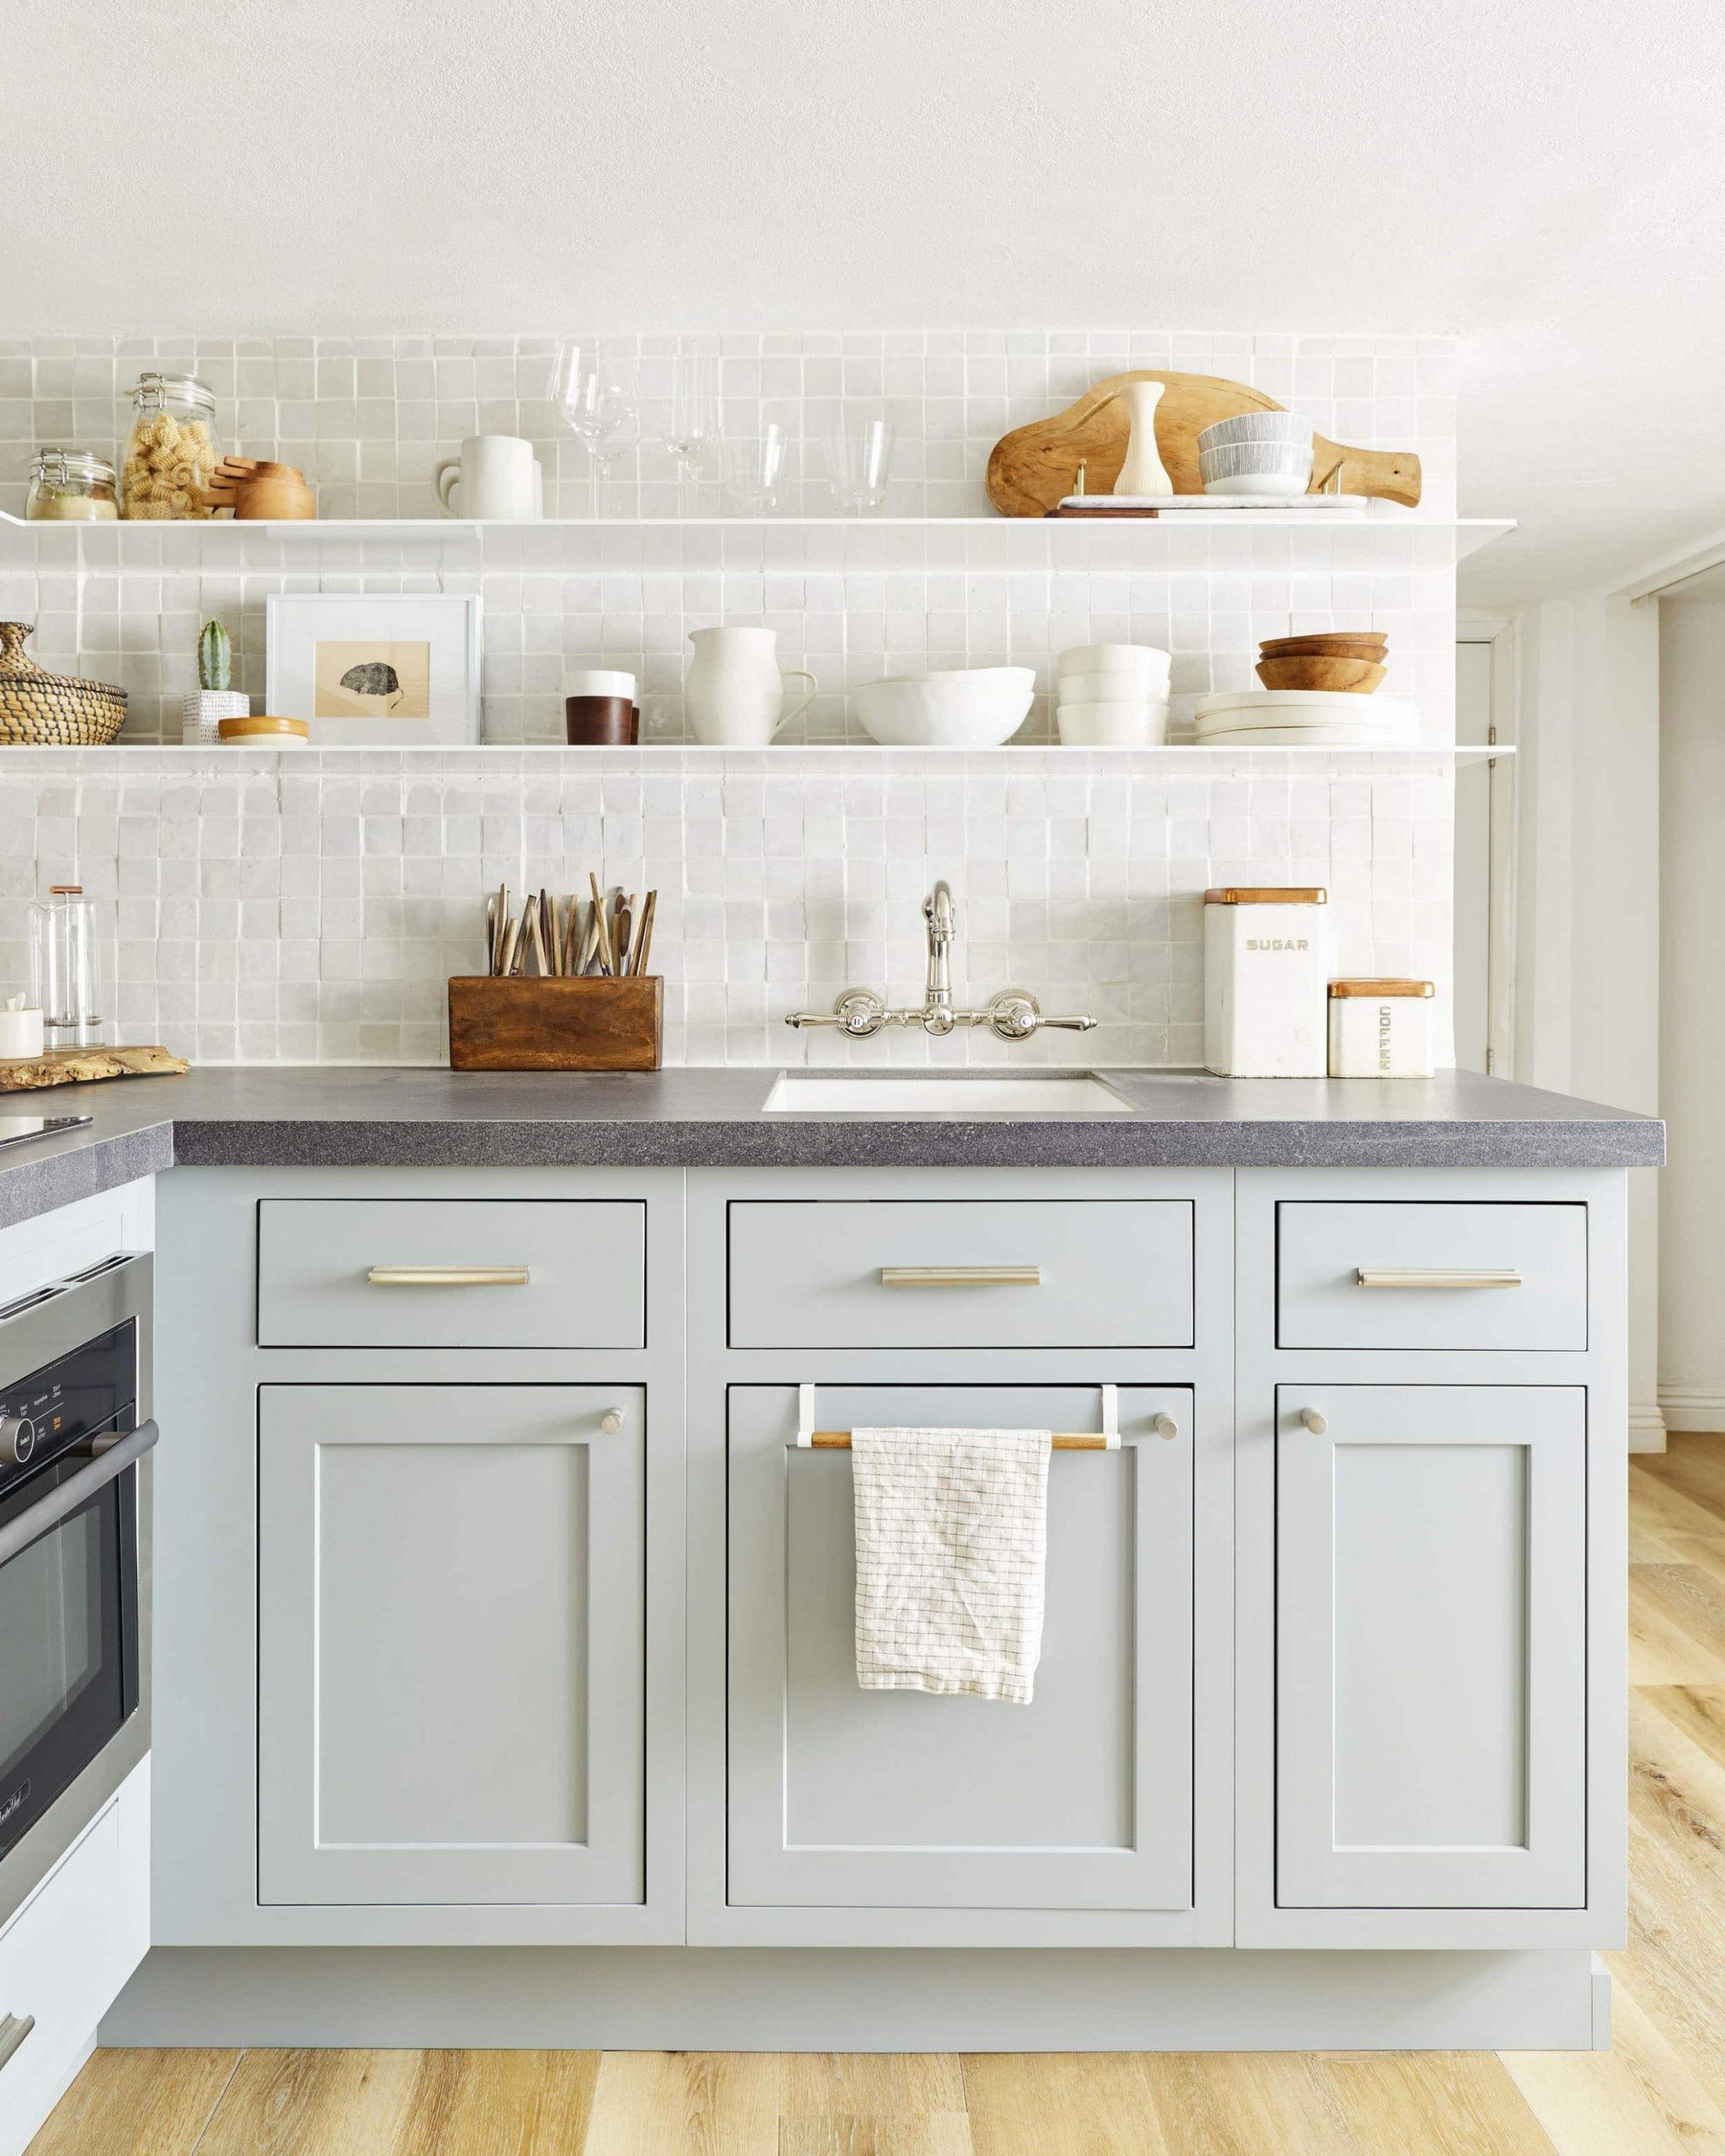 10 of Our Favorite (Budget-Friendly) Cabinet Hardware Picks - Kitchen Cabinet Handle Design